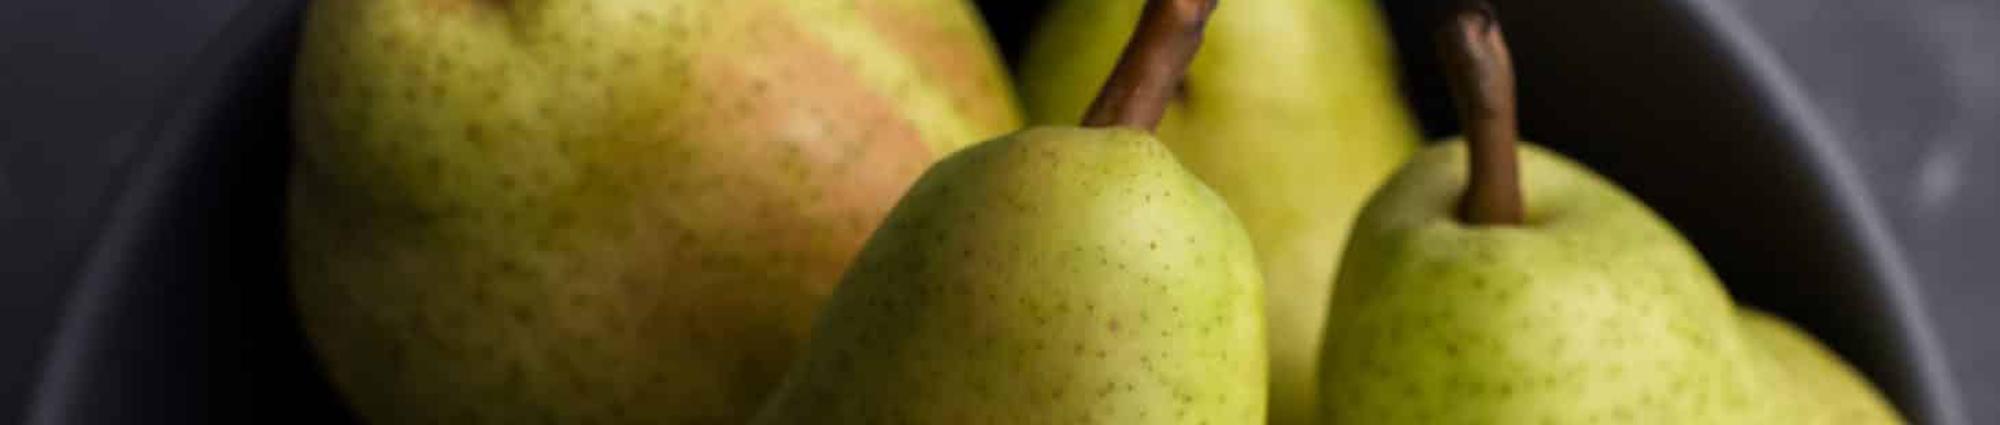 CAGROWN Bartlett Pears